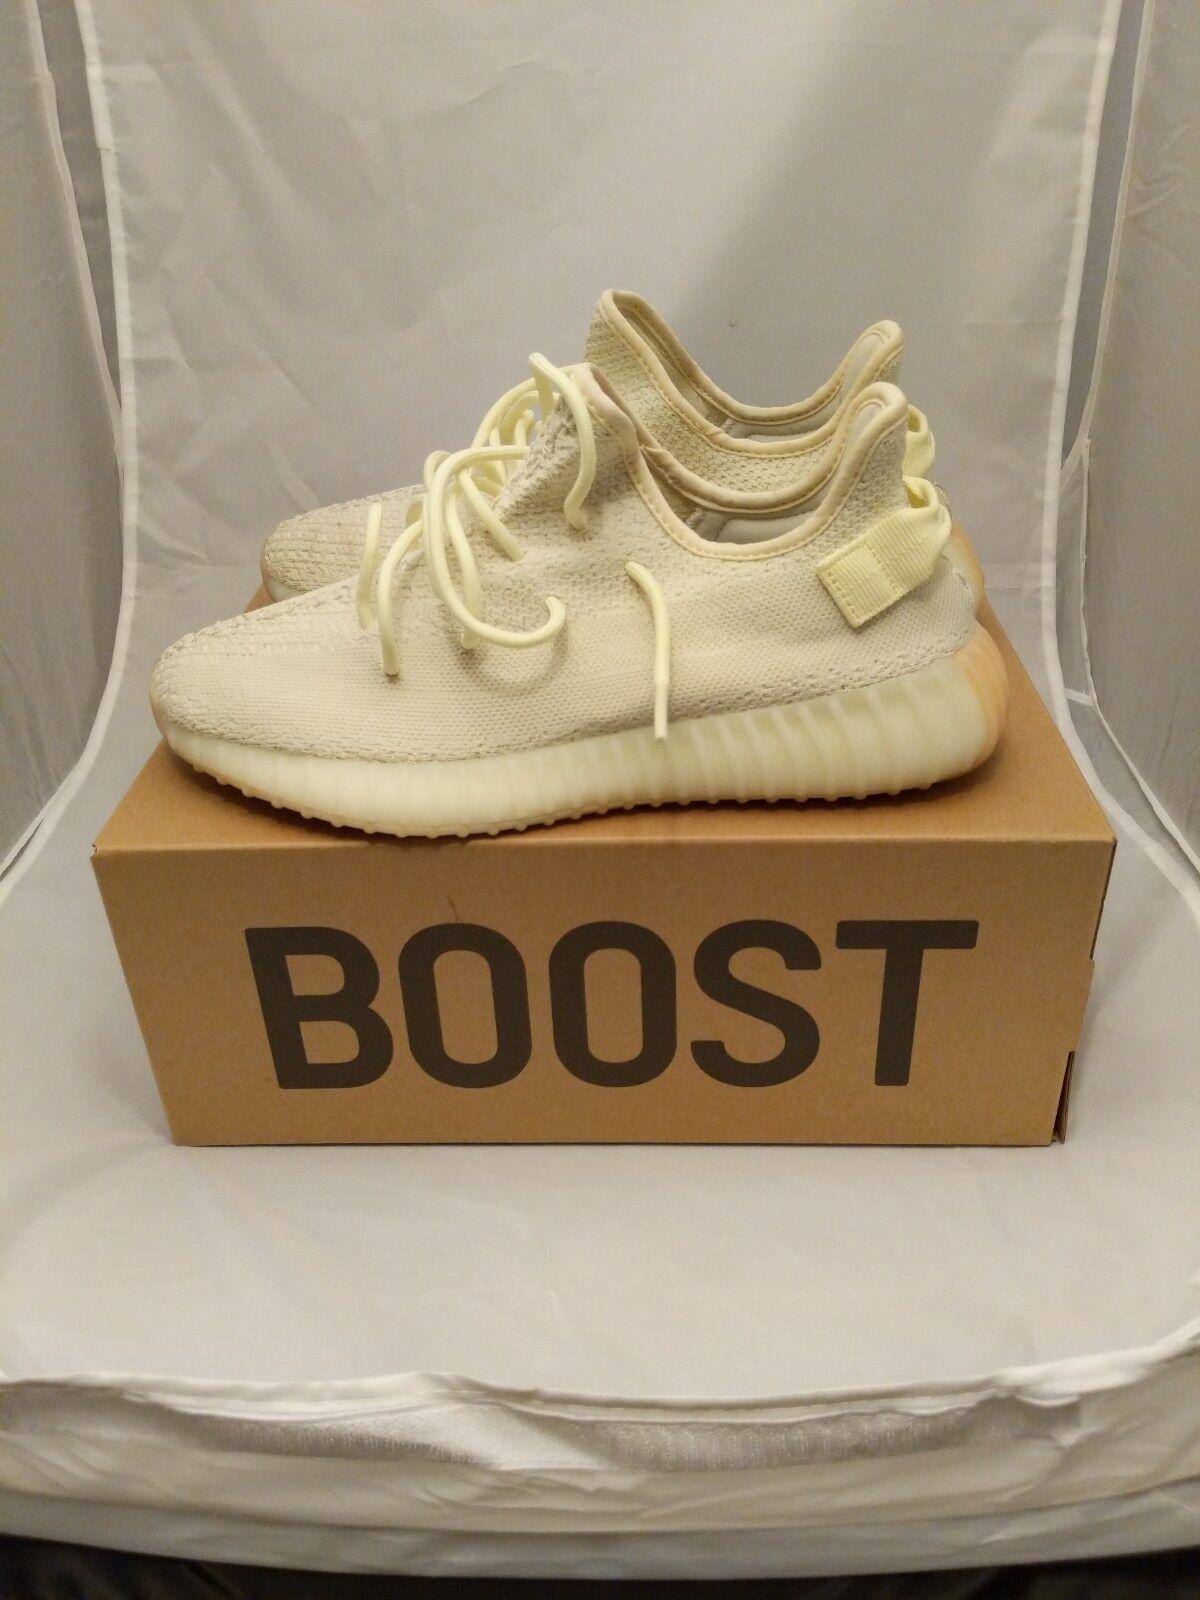 Adidas Yeeze 350 V2 Butter size 10